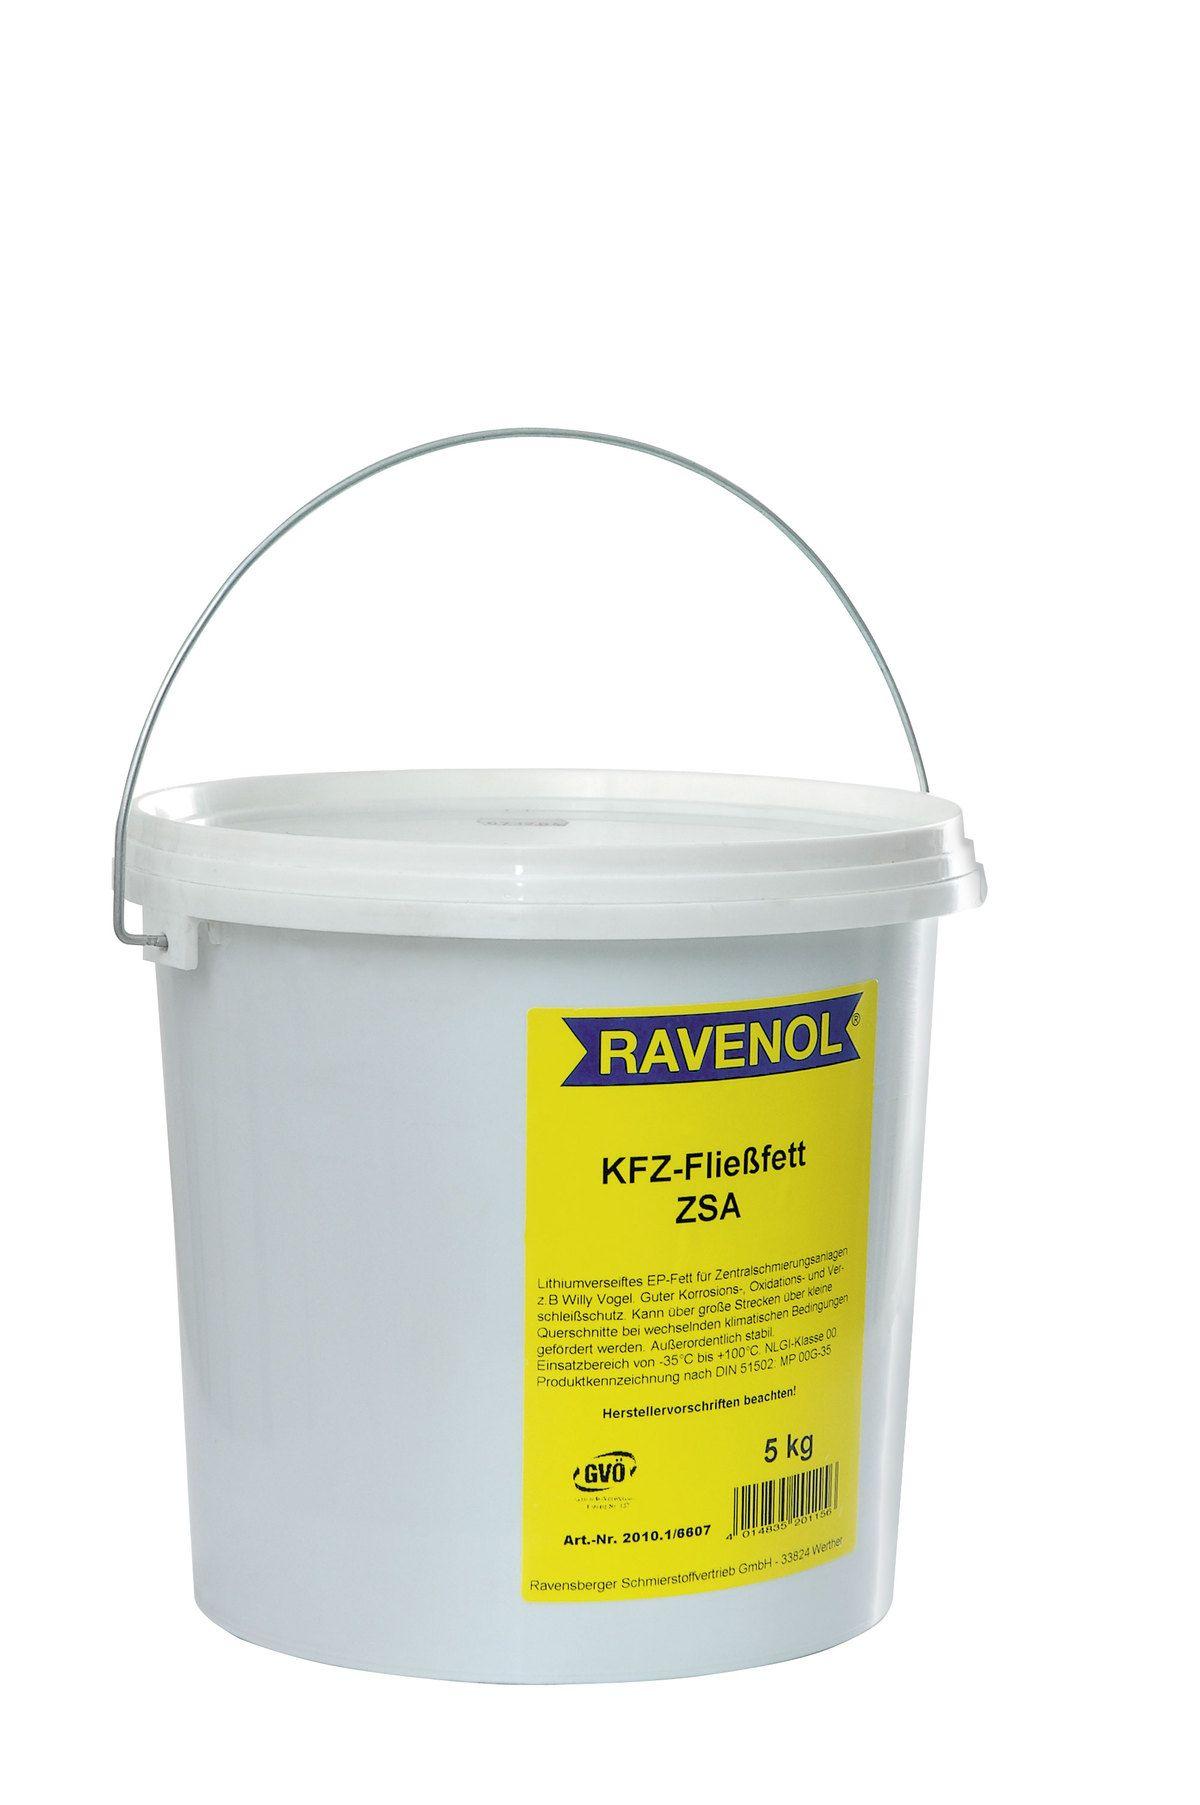 Смазка Ravenol KFZ-Fliessfett ZSA (5кг) от Ravta